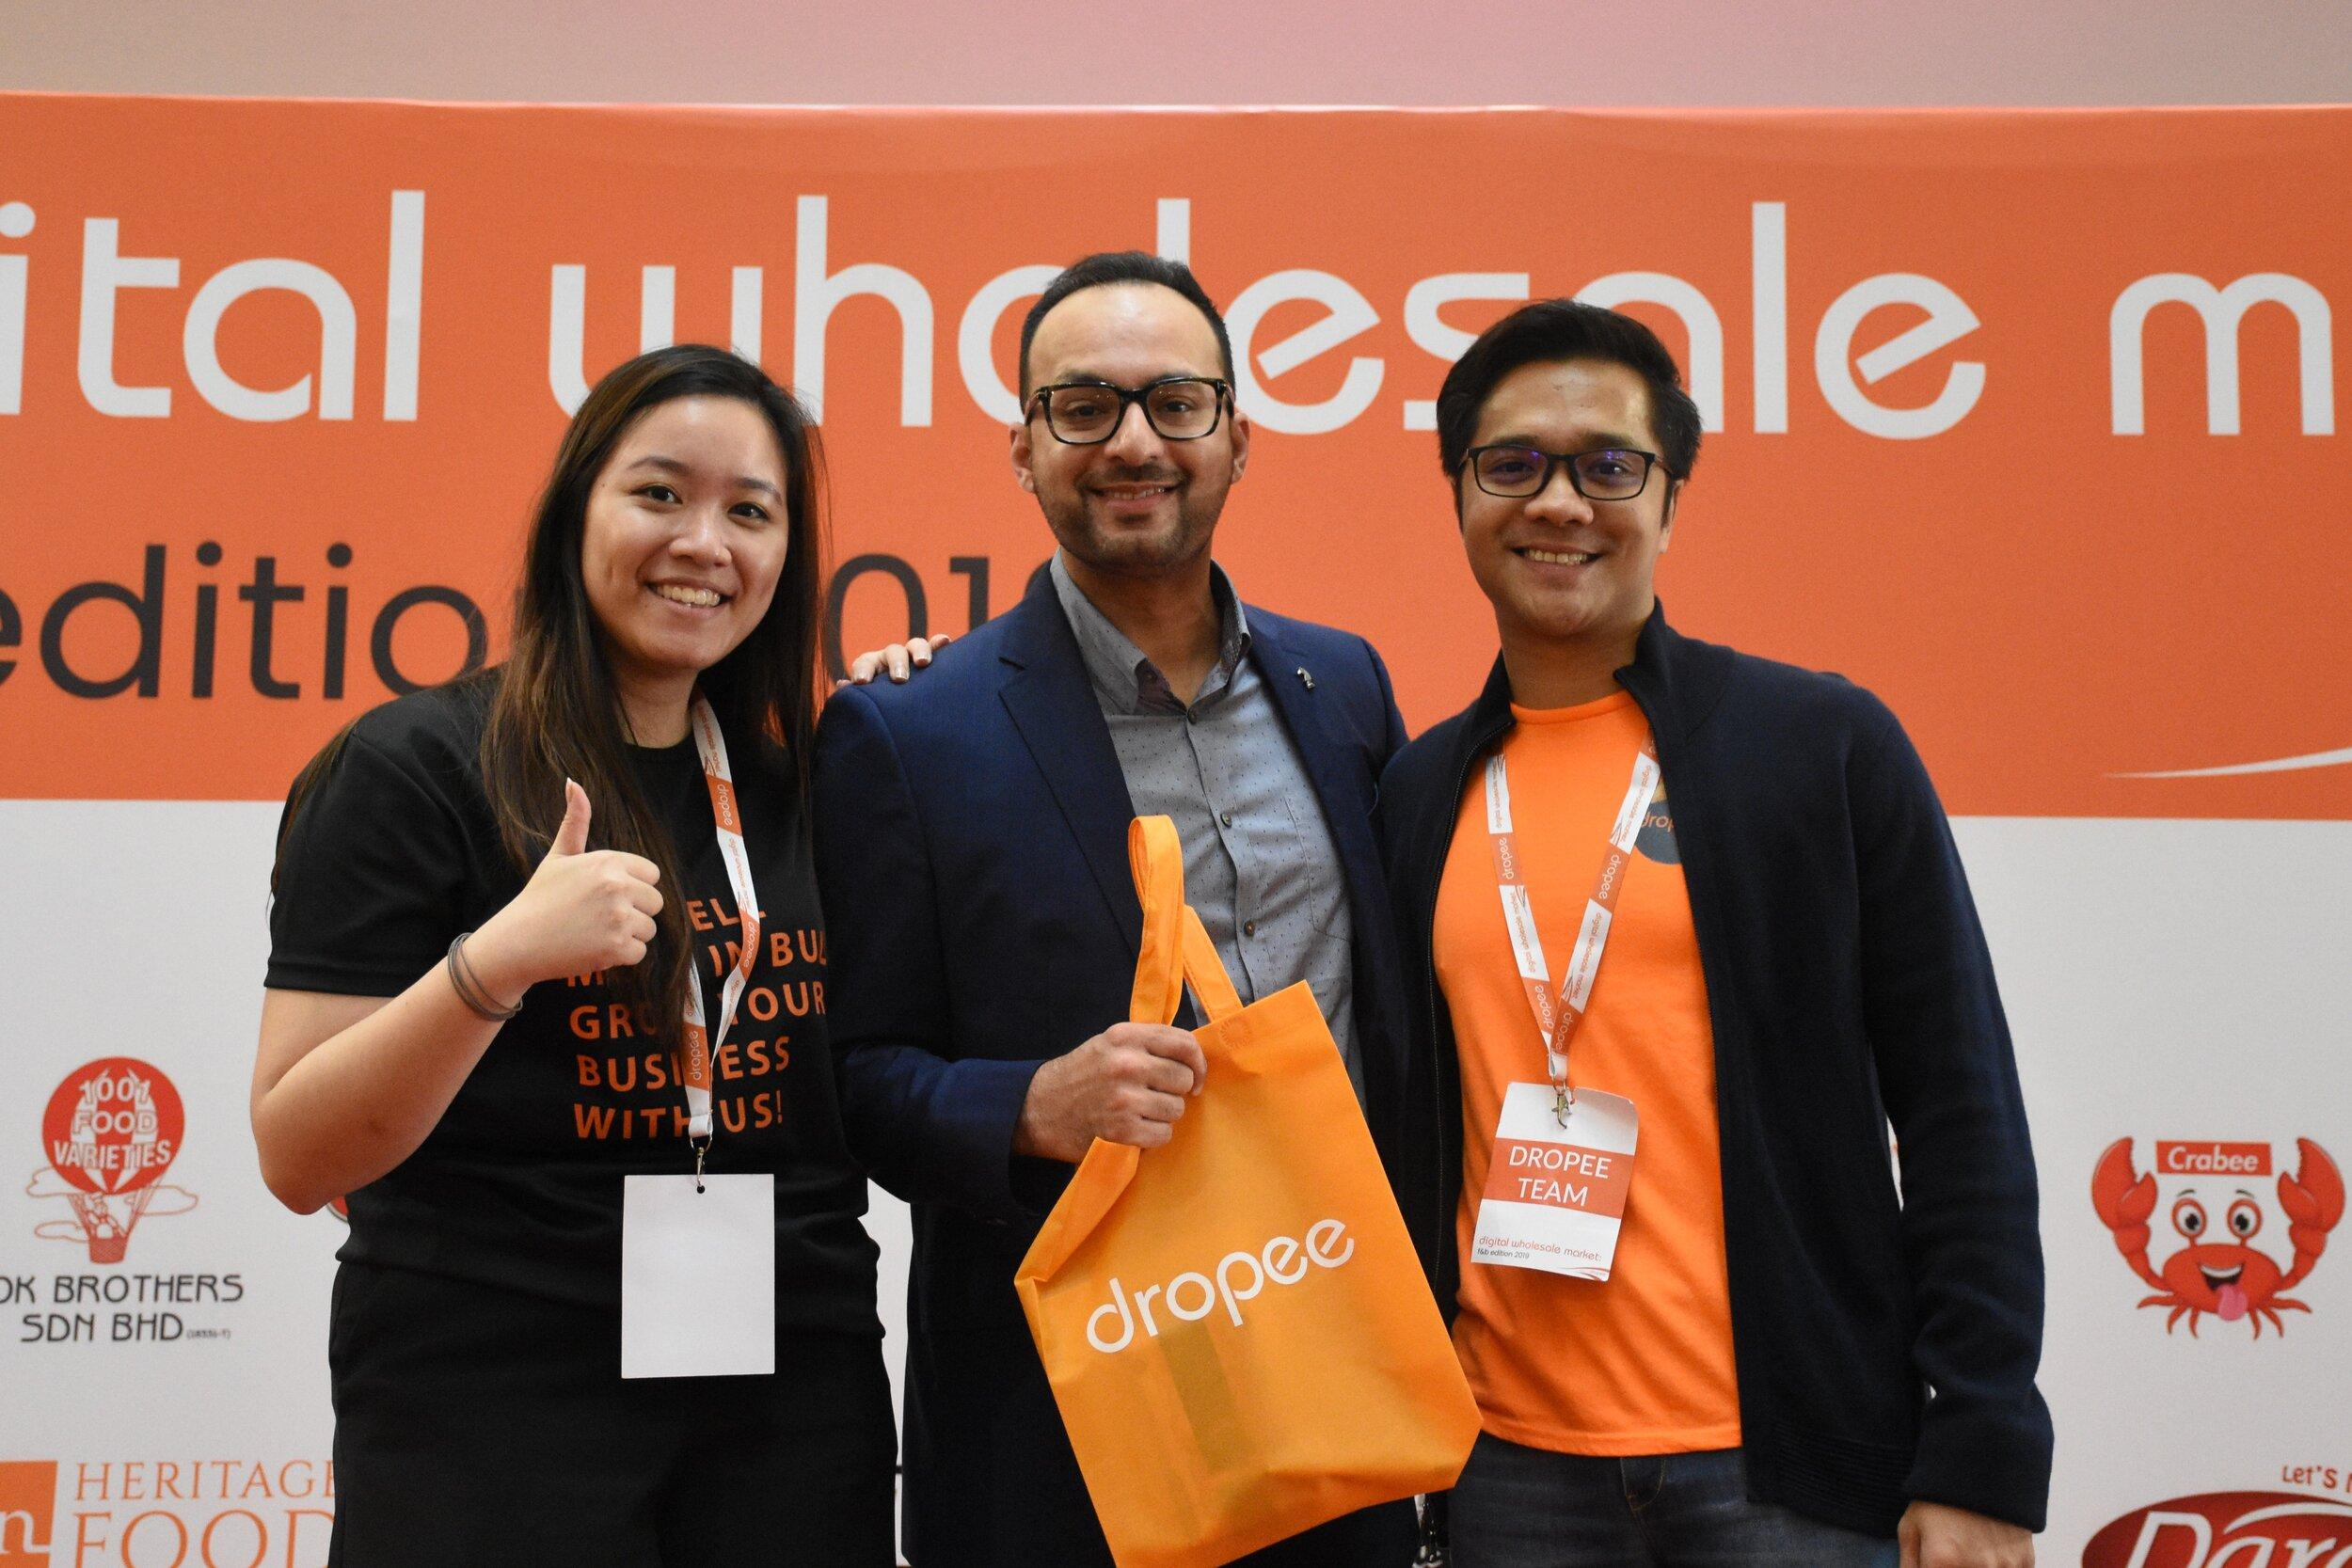 Lennise Ng (Dropee CEO), Imran Shahid (Maxis Head of Solution Sales & Presales), and Aizat Rahim (Dropee COO) at Dropee's Digital Wholesale Market: F&B Edition 2019.